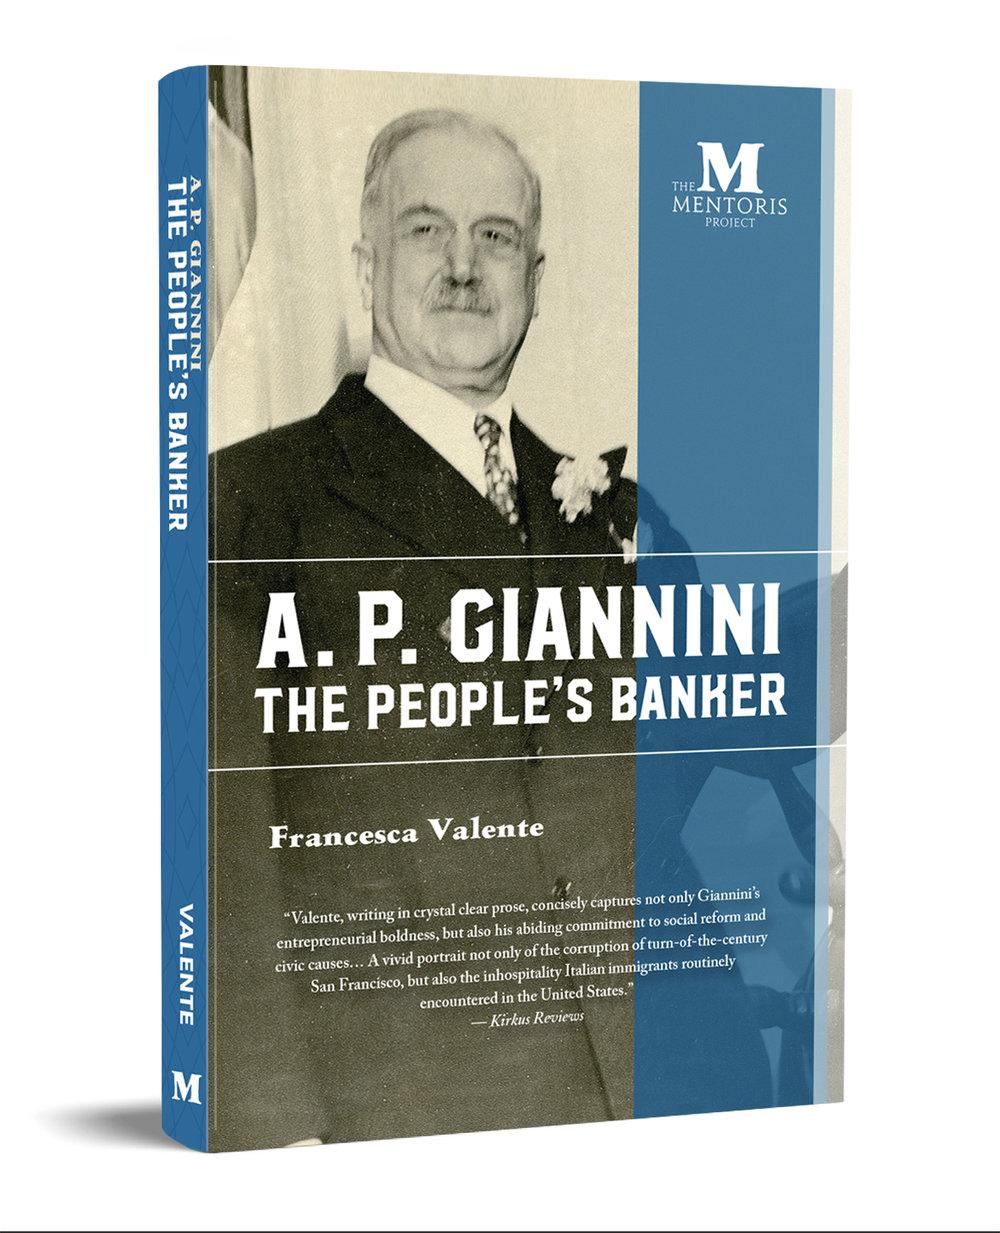 Giannini-Icon-3-28.jpg